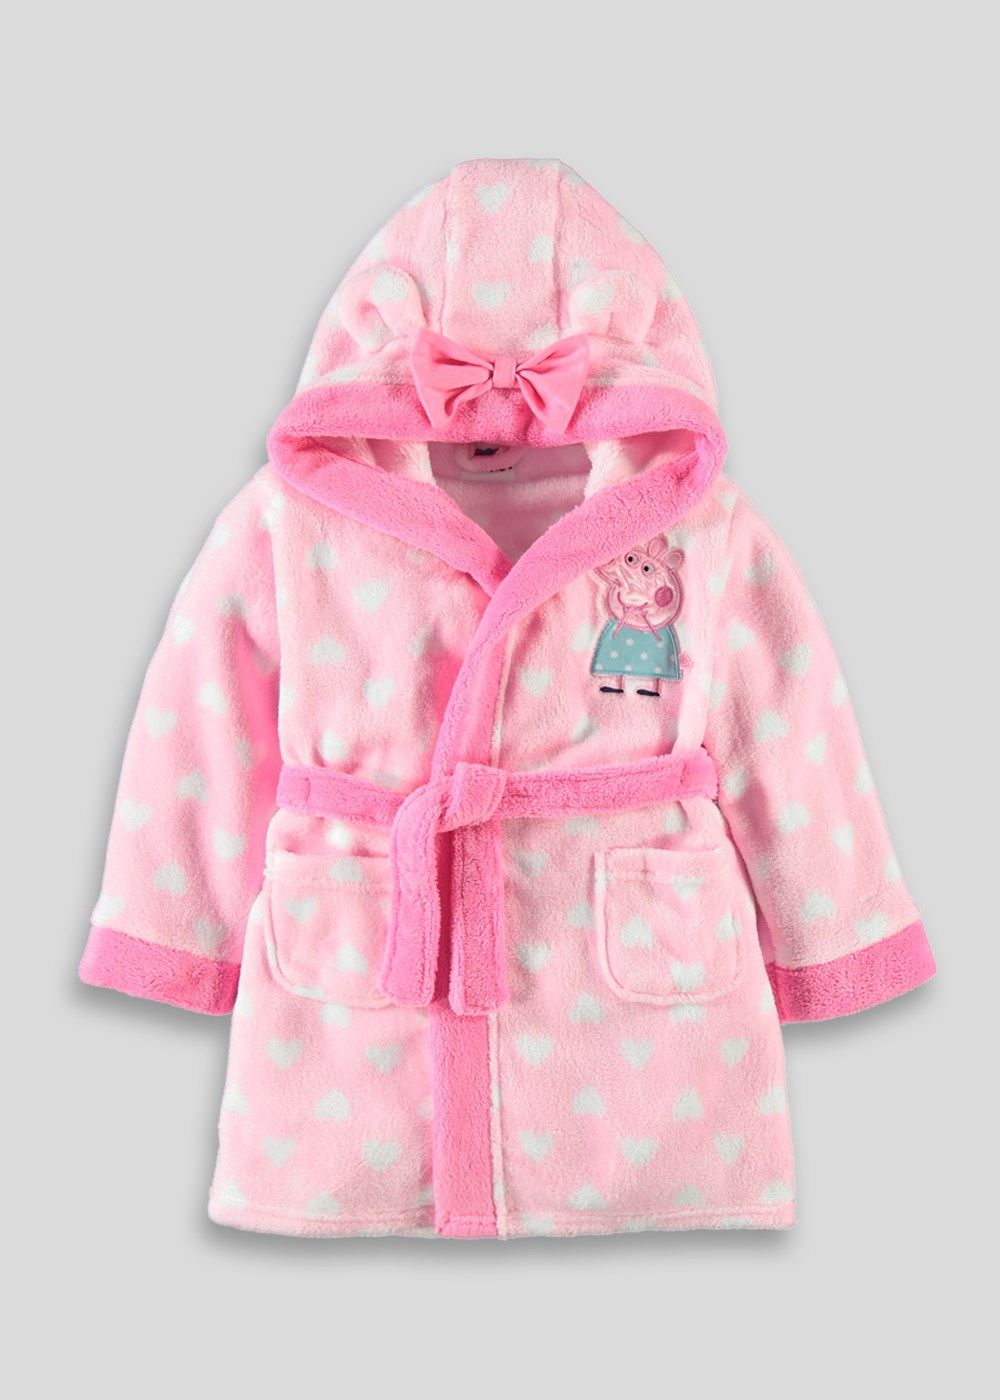 60da3aa28c8a0 Girls Peppa Pig Dressing Gown (9mths - 5yrs) by Matalan | + Macey's ...